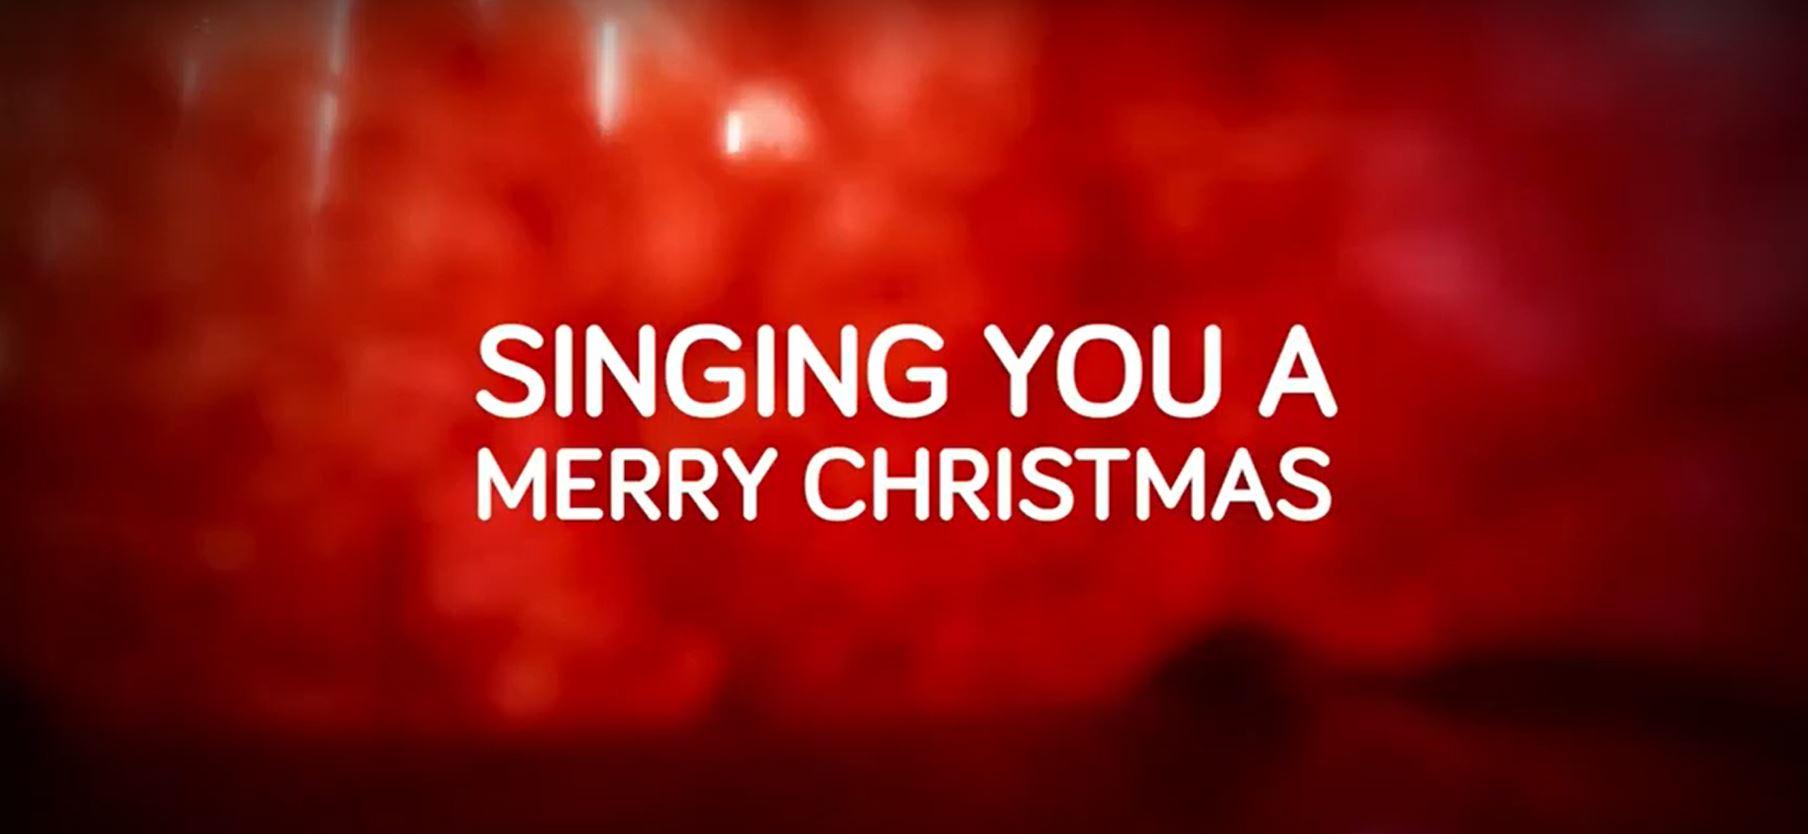 A Christmas cracker of a social media campaign